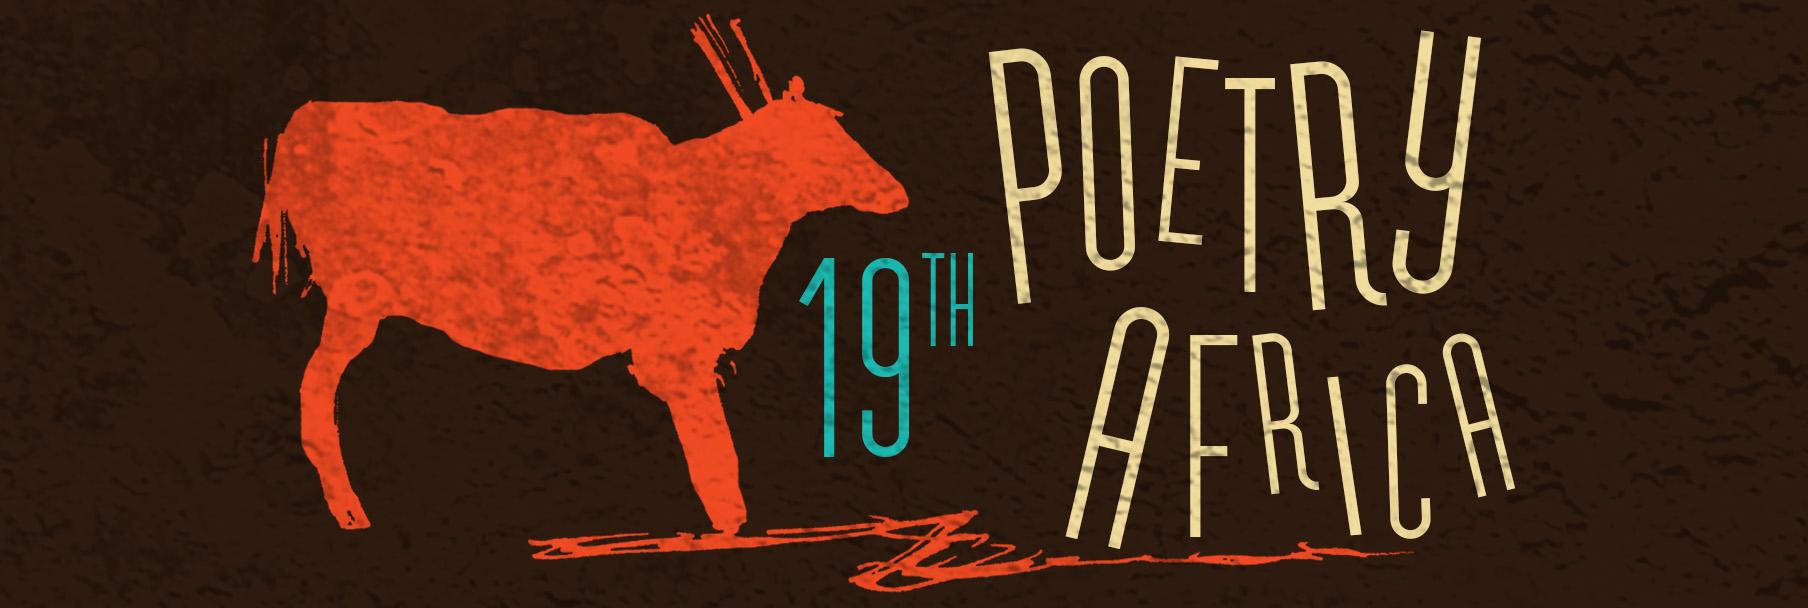 Celebrate the spoken word